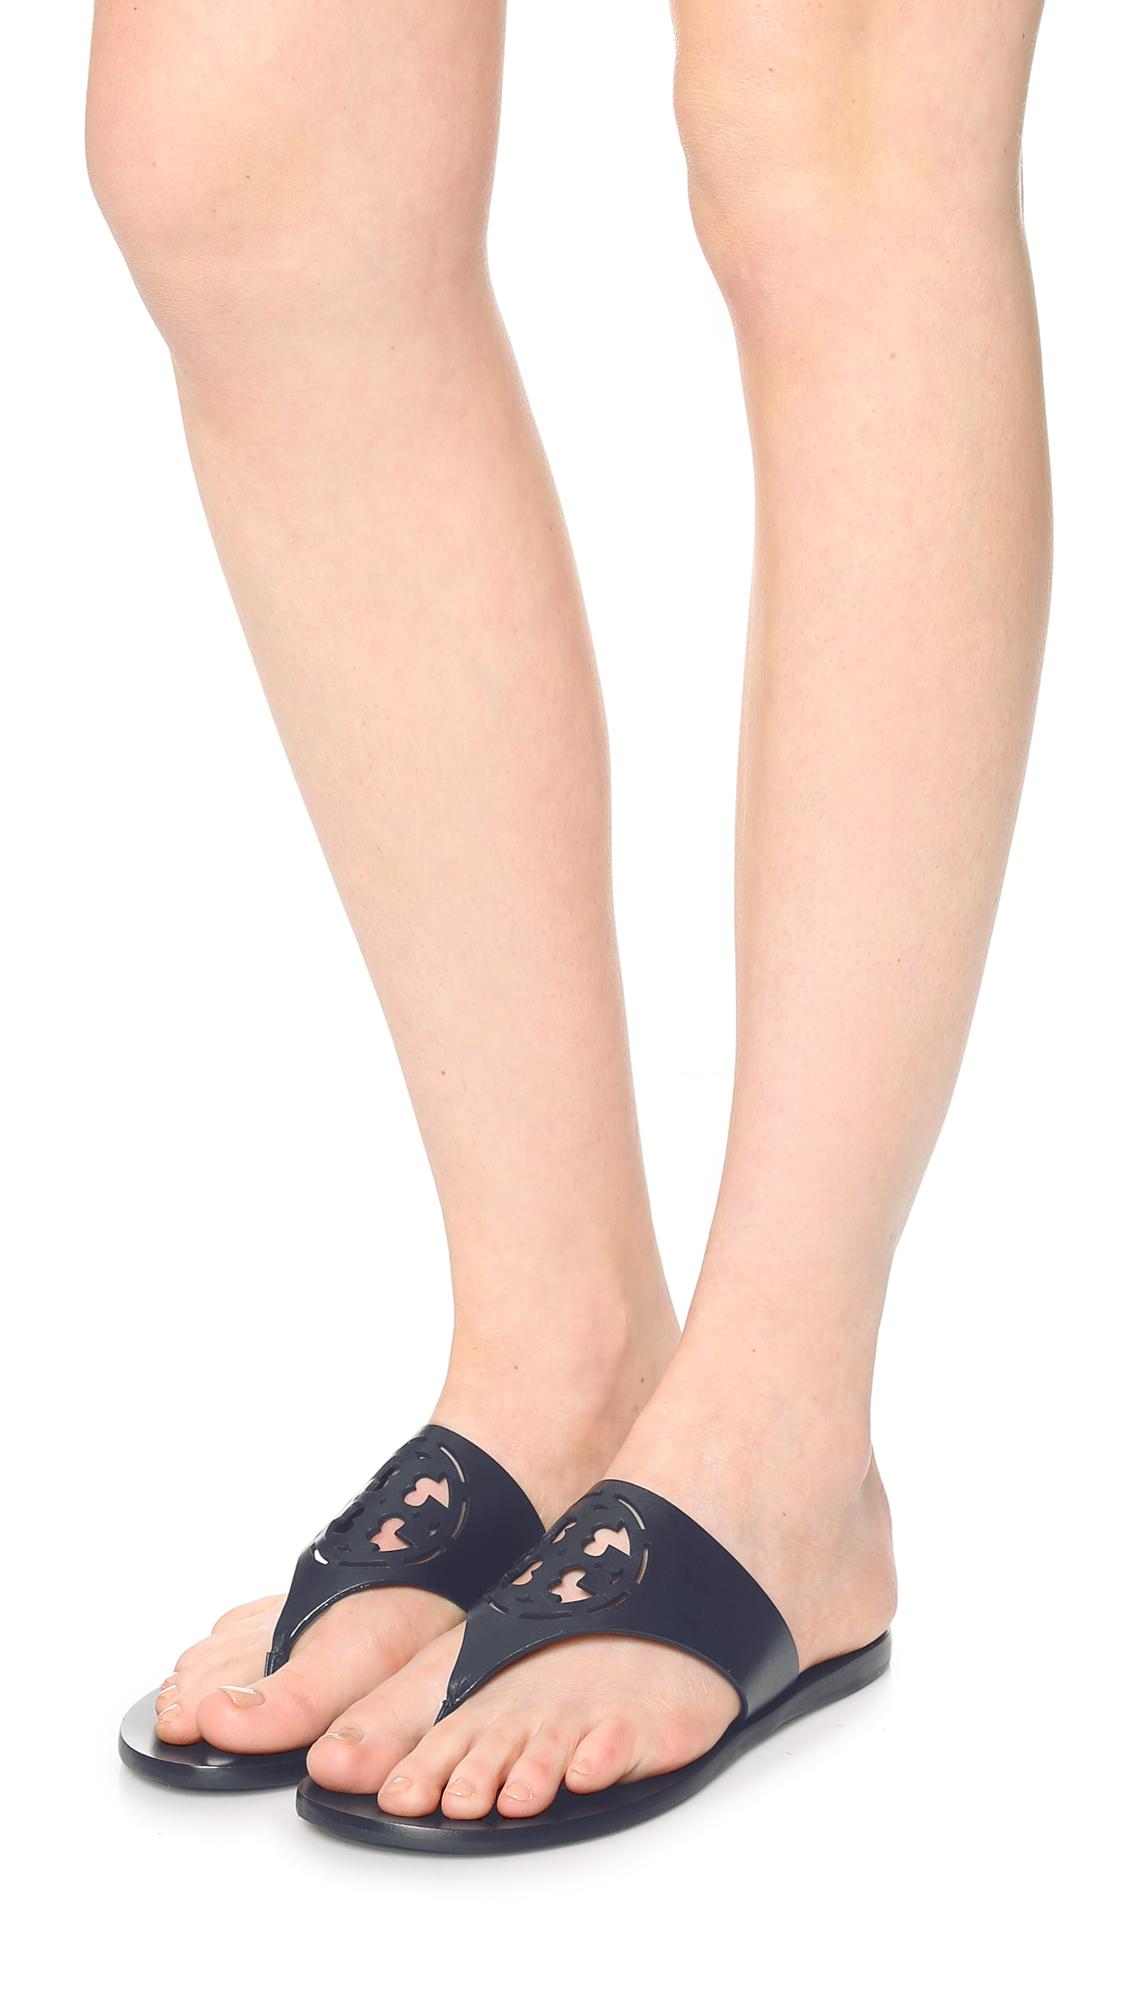 b98695a17 Tory Burch Zoey Thong Sandals